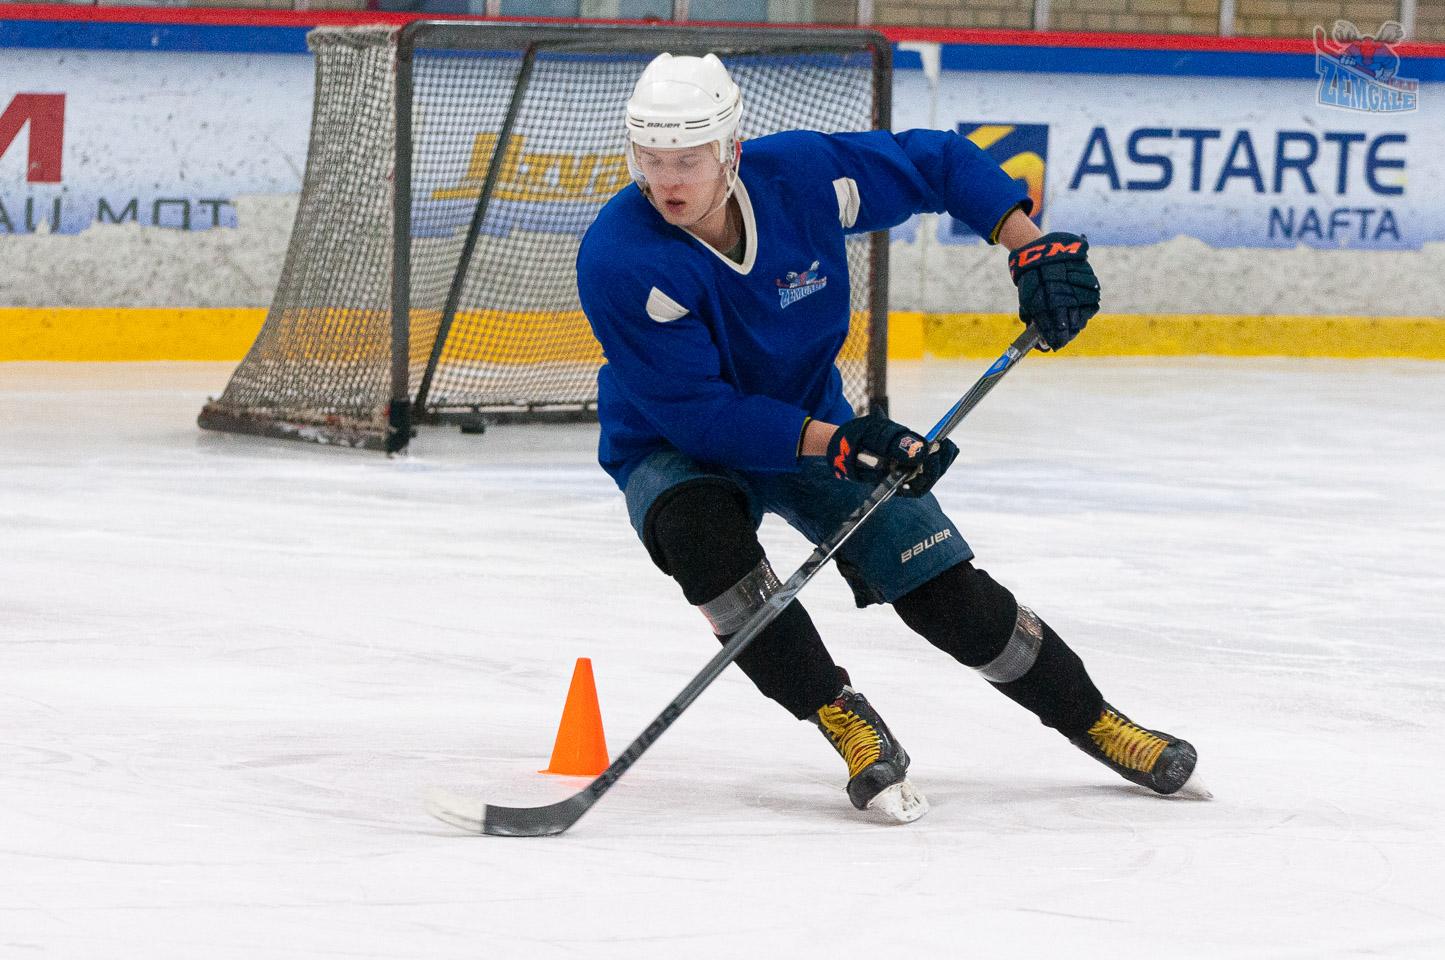 Hokejist ar nūju apslido konusu uz ledus